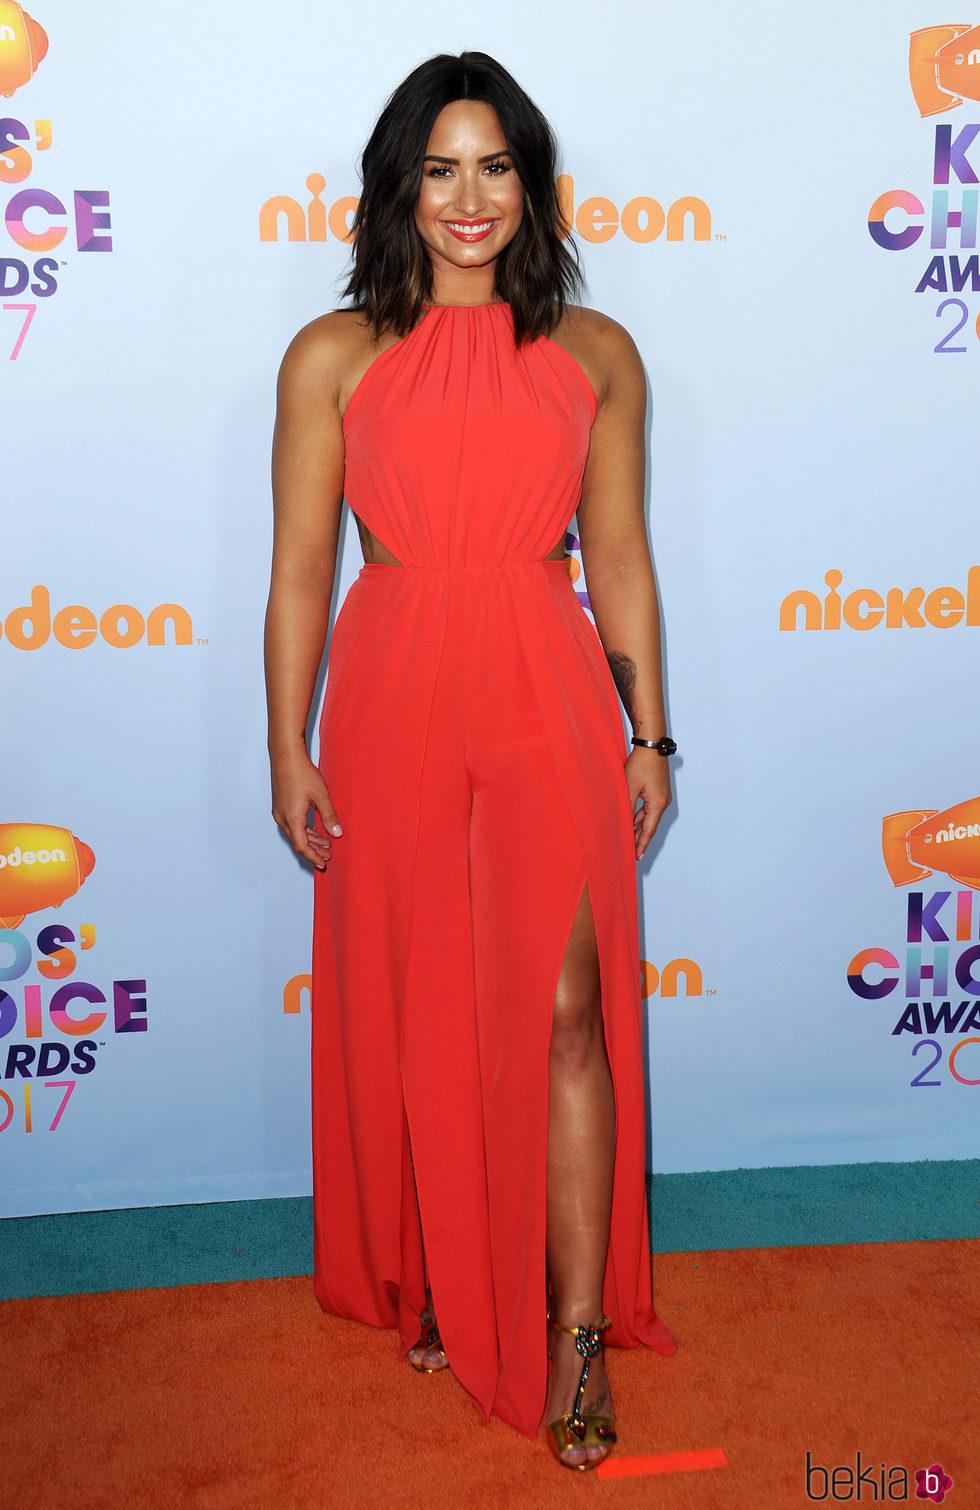 Demi Lovato en los Nickelodeon Kids' Choice Awards 2017